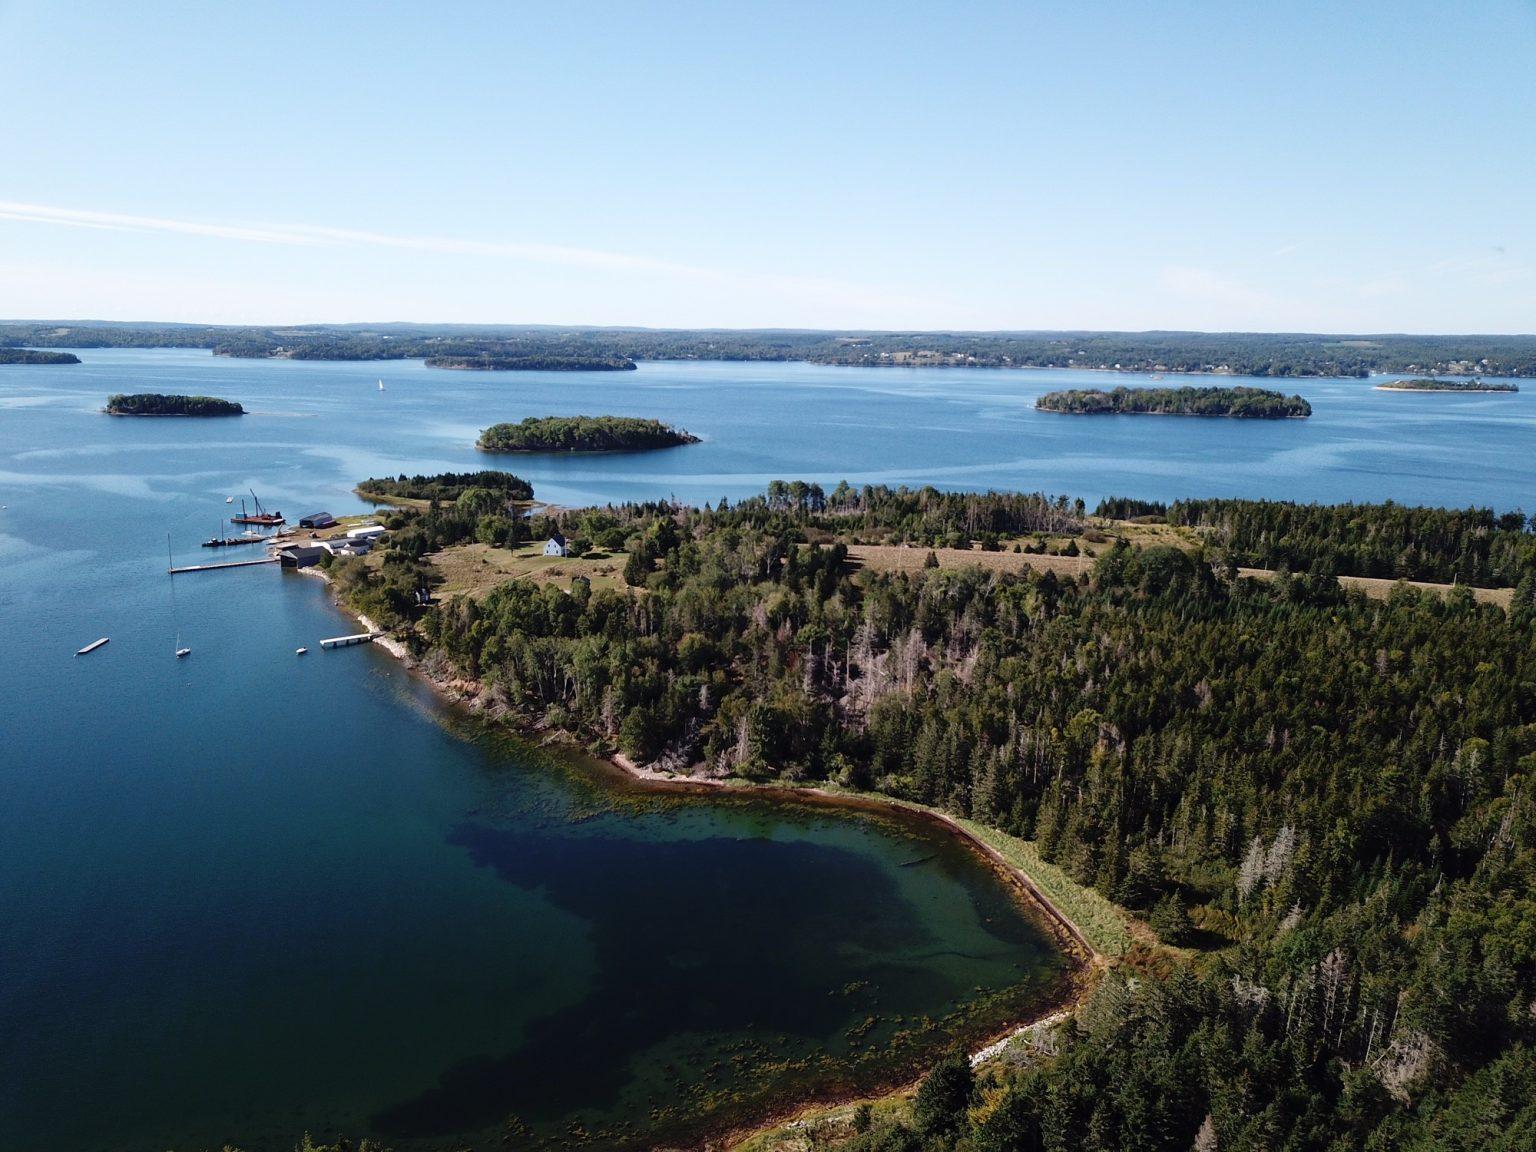 Sailing tours area, islands in Mahone Bay, Nova Scotia